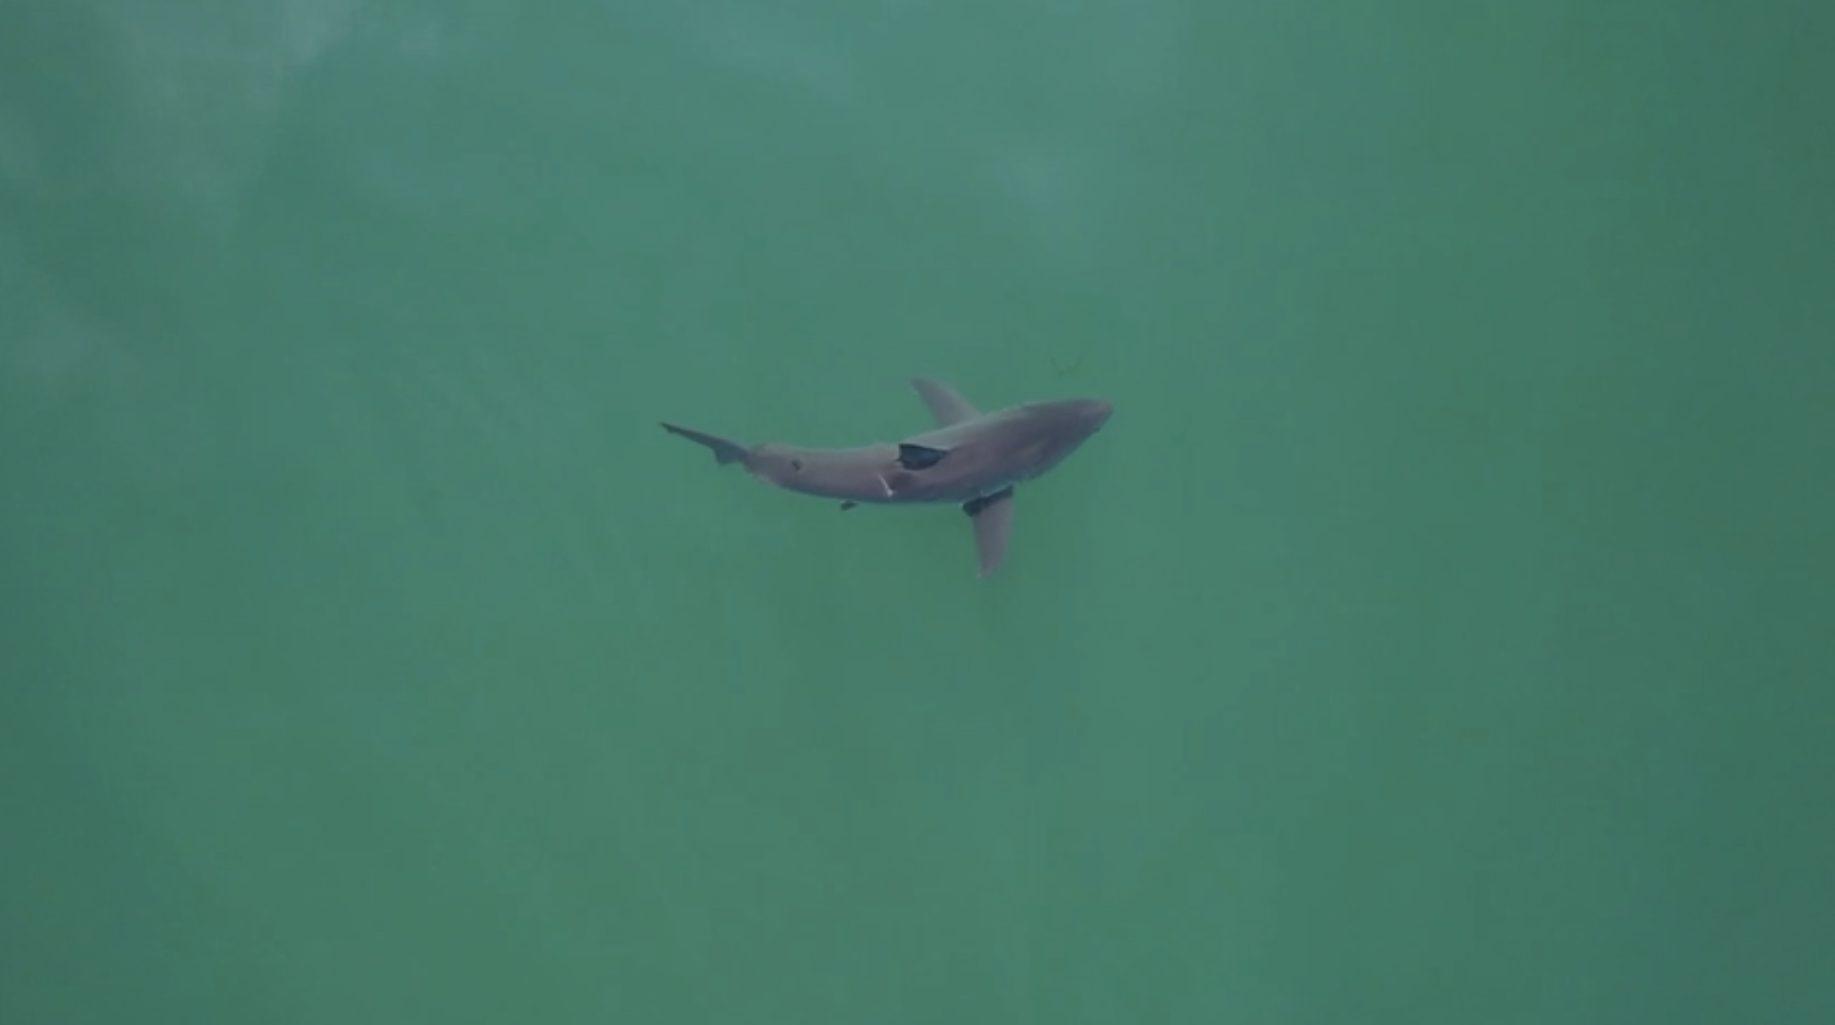 SharkEye uses drones and AI to keep beachgoers safe from sharks